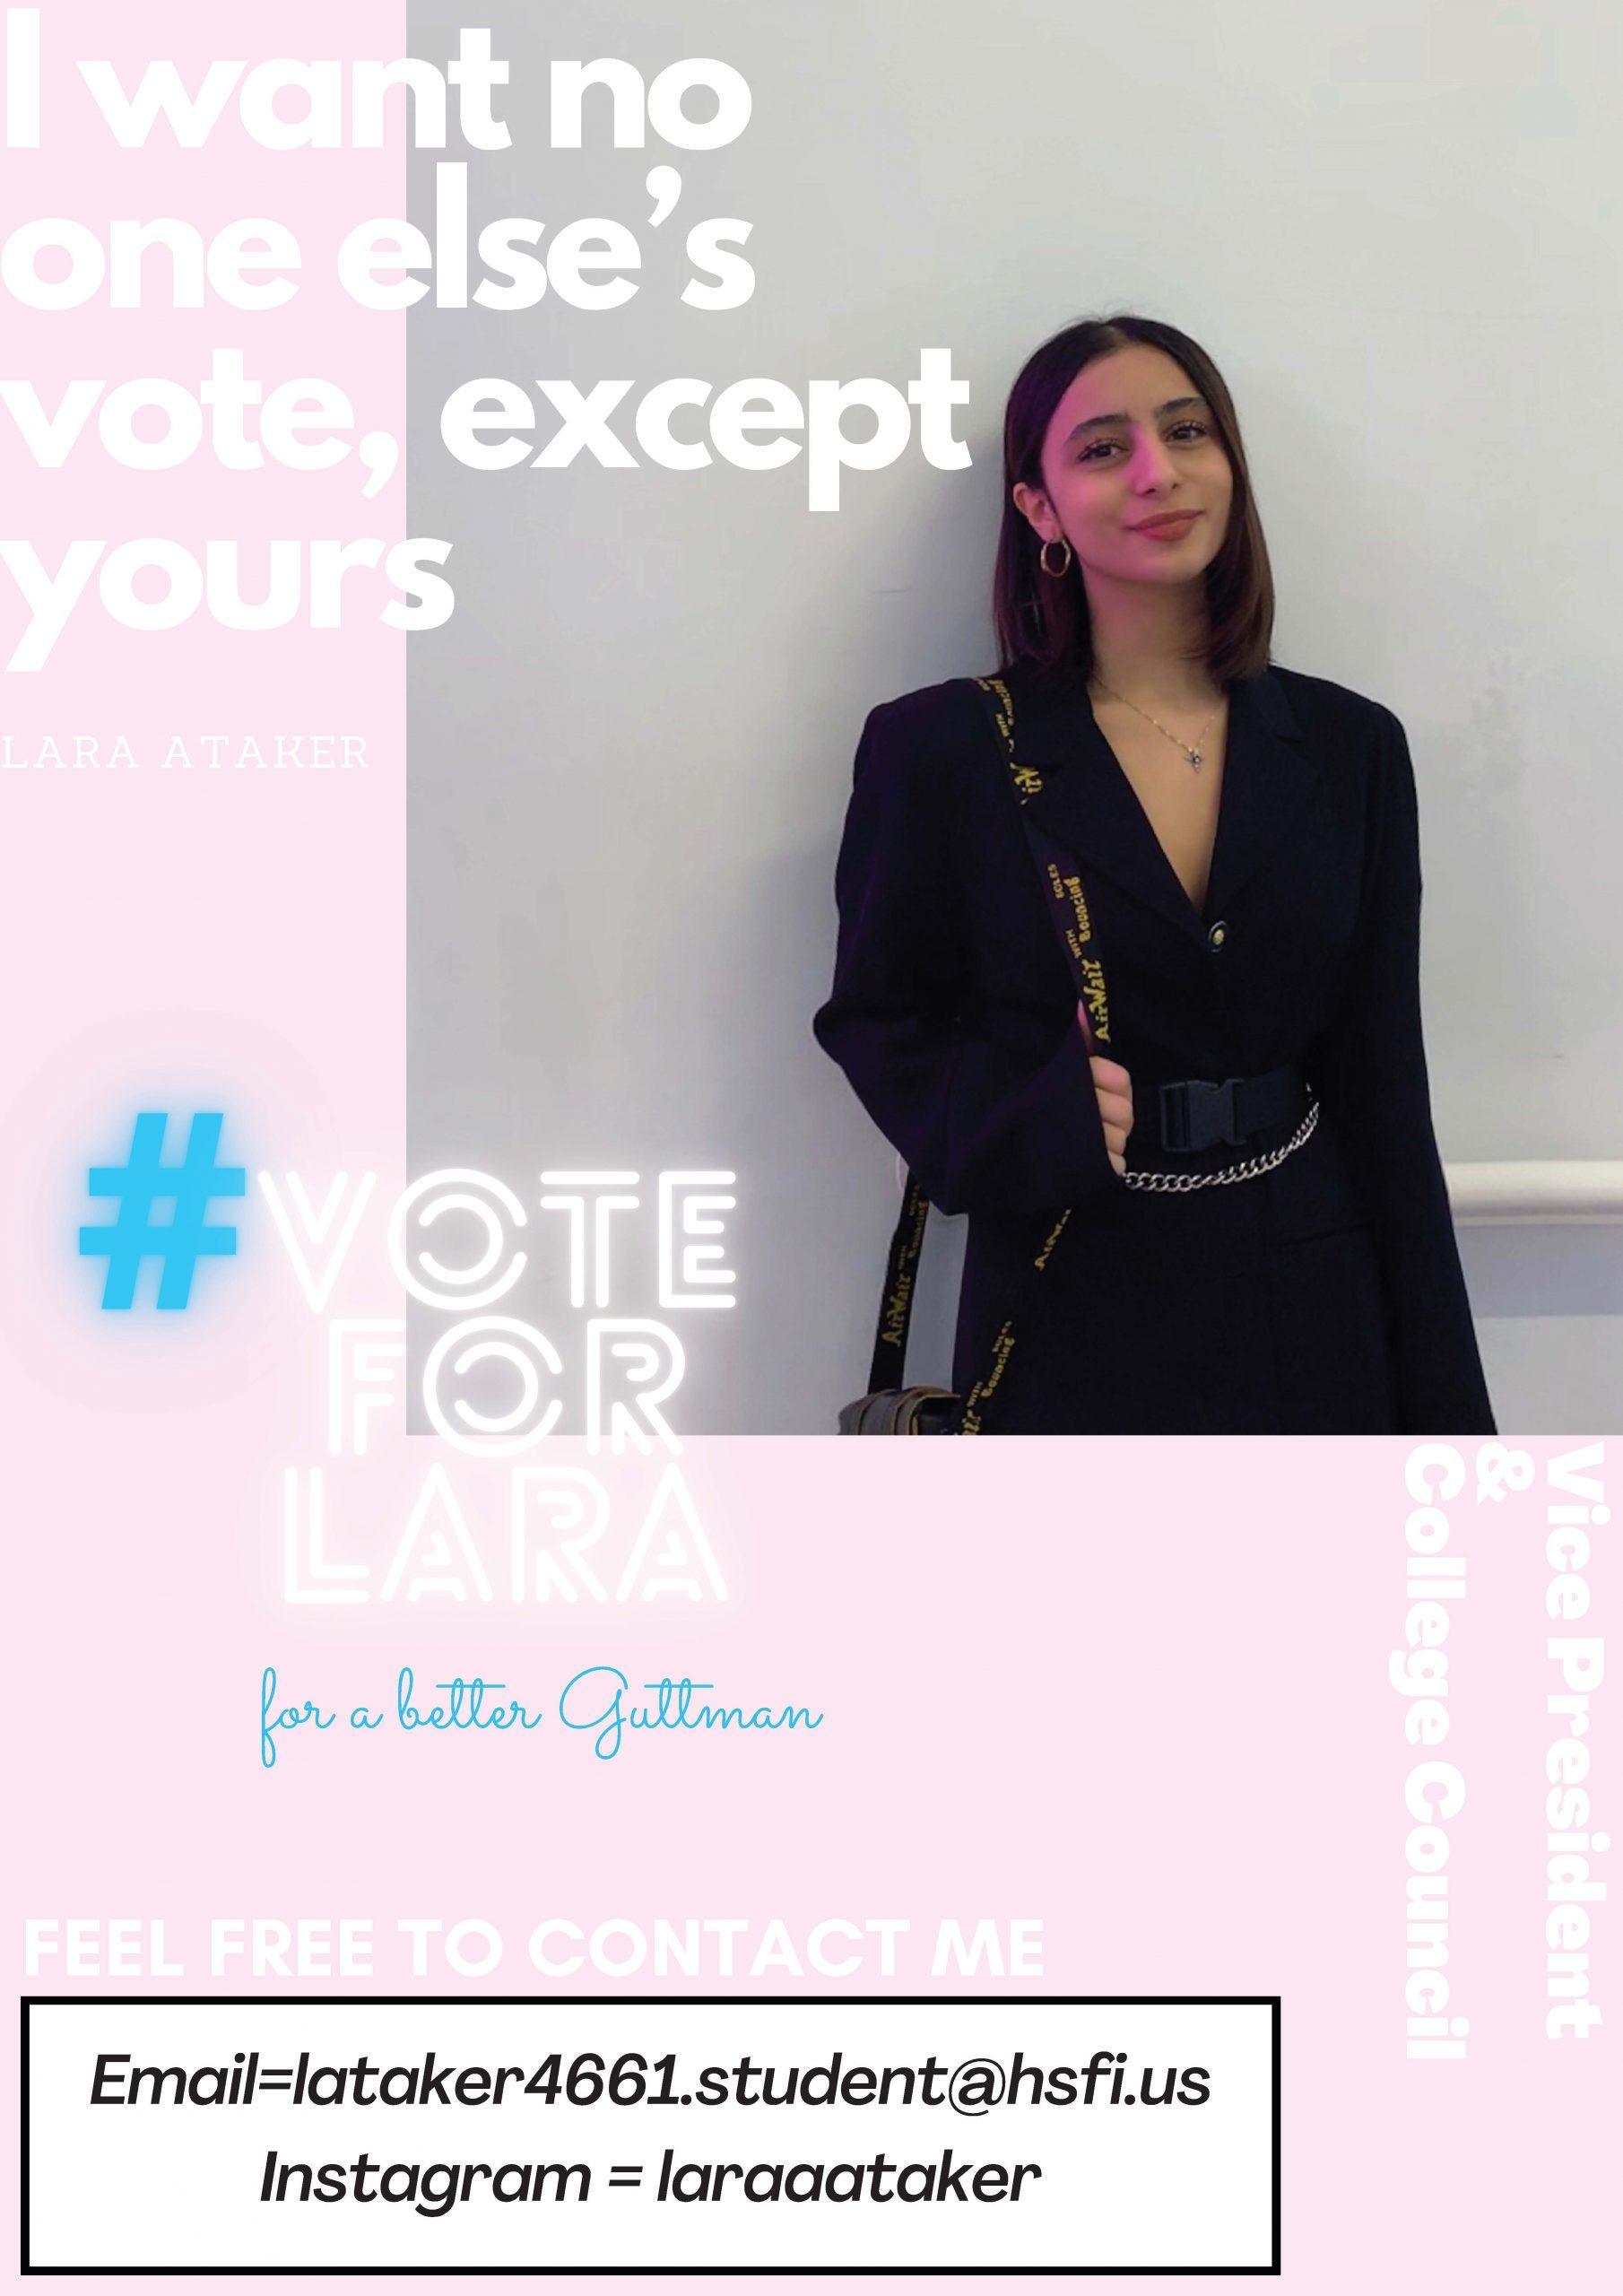 Lara for Vice President